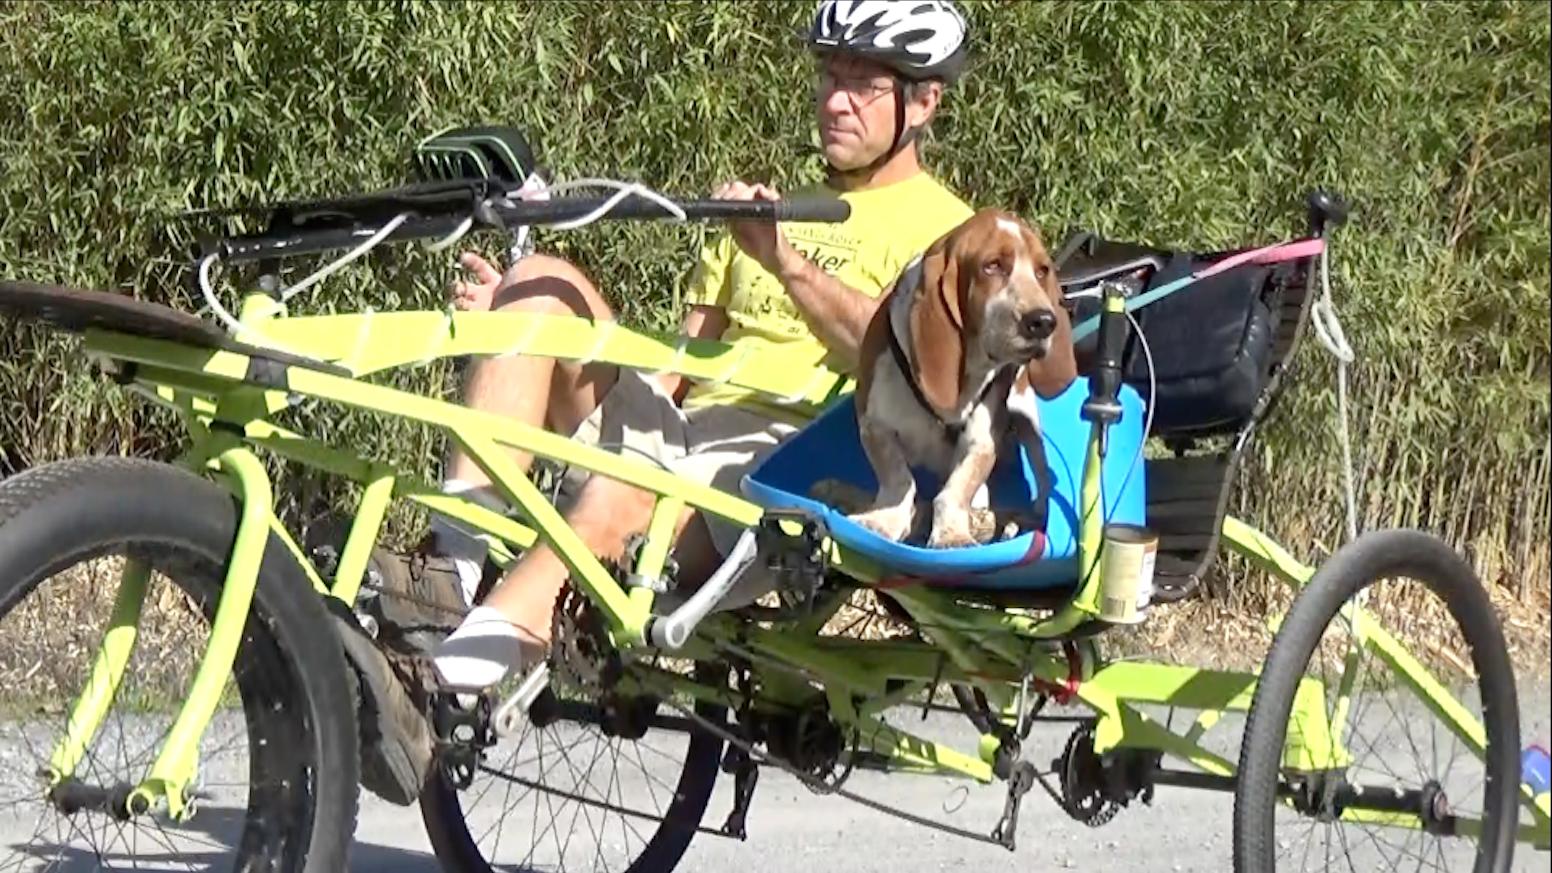 Safari Trike - A Sociable Tandem for Everyone by Dawn Thomas